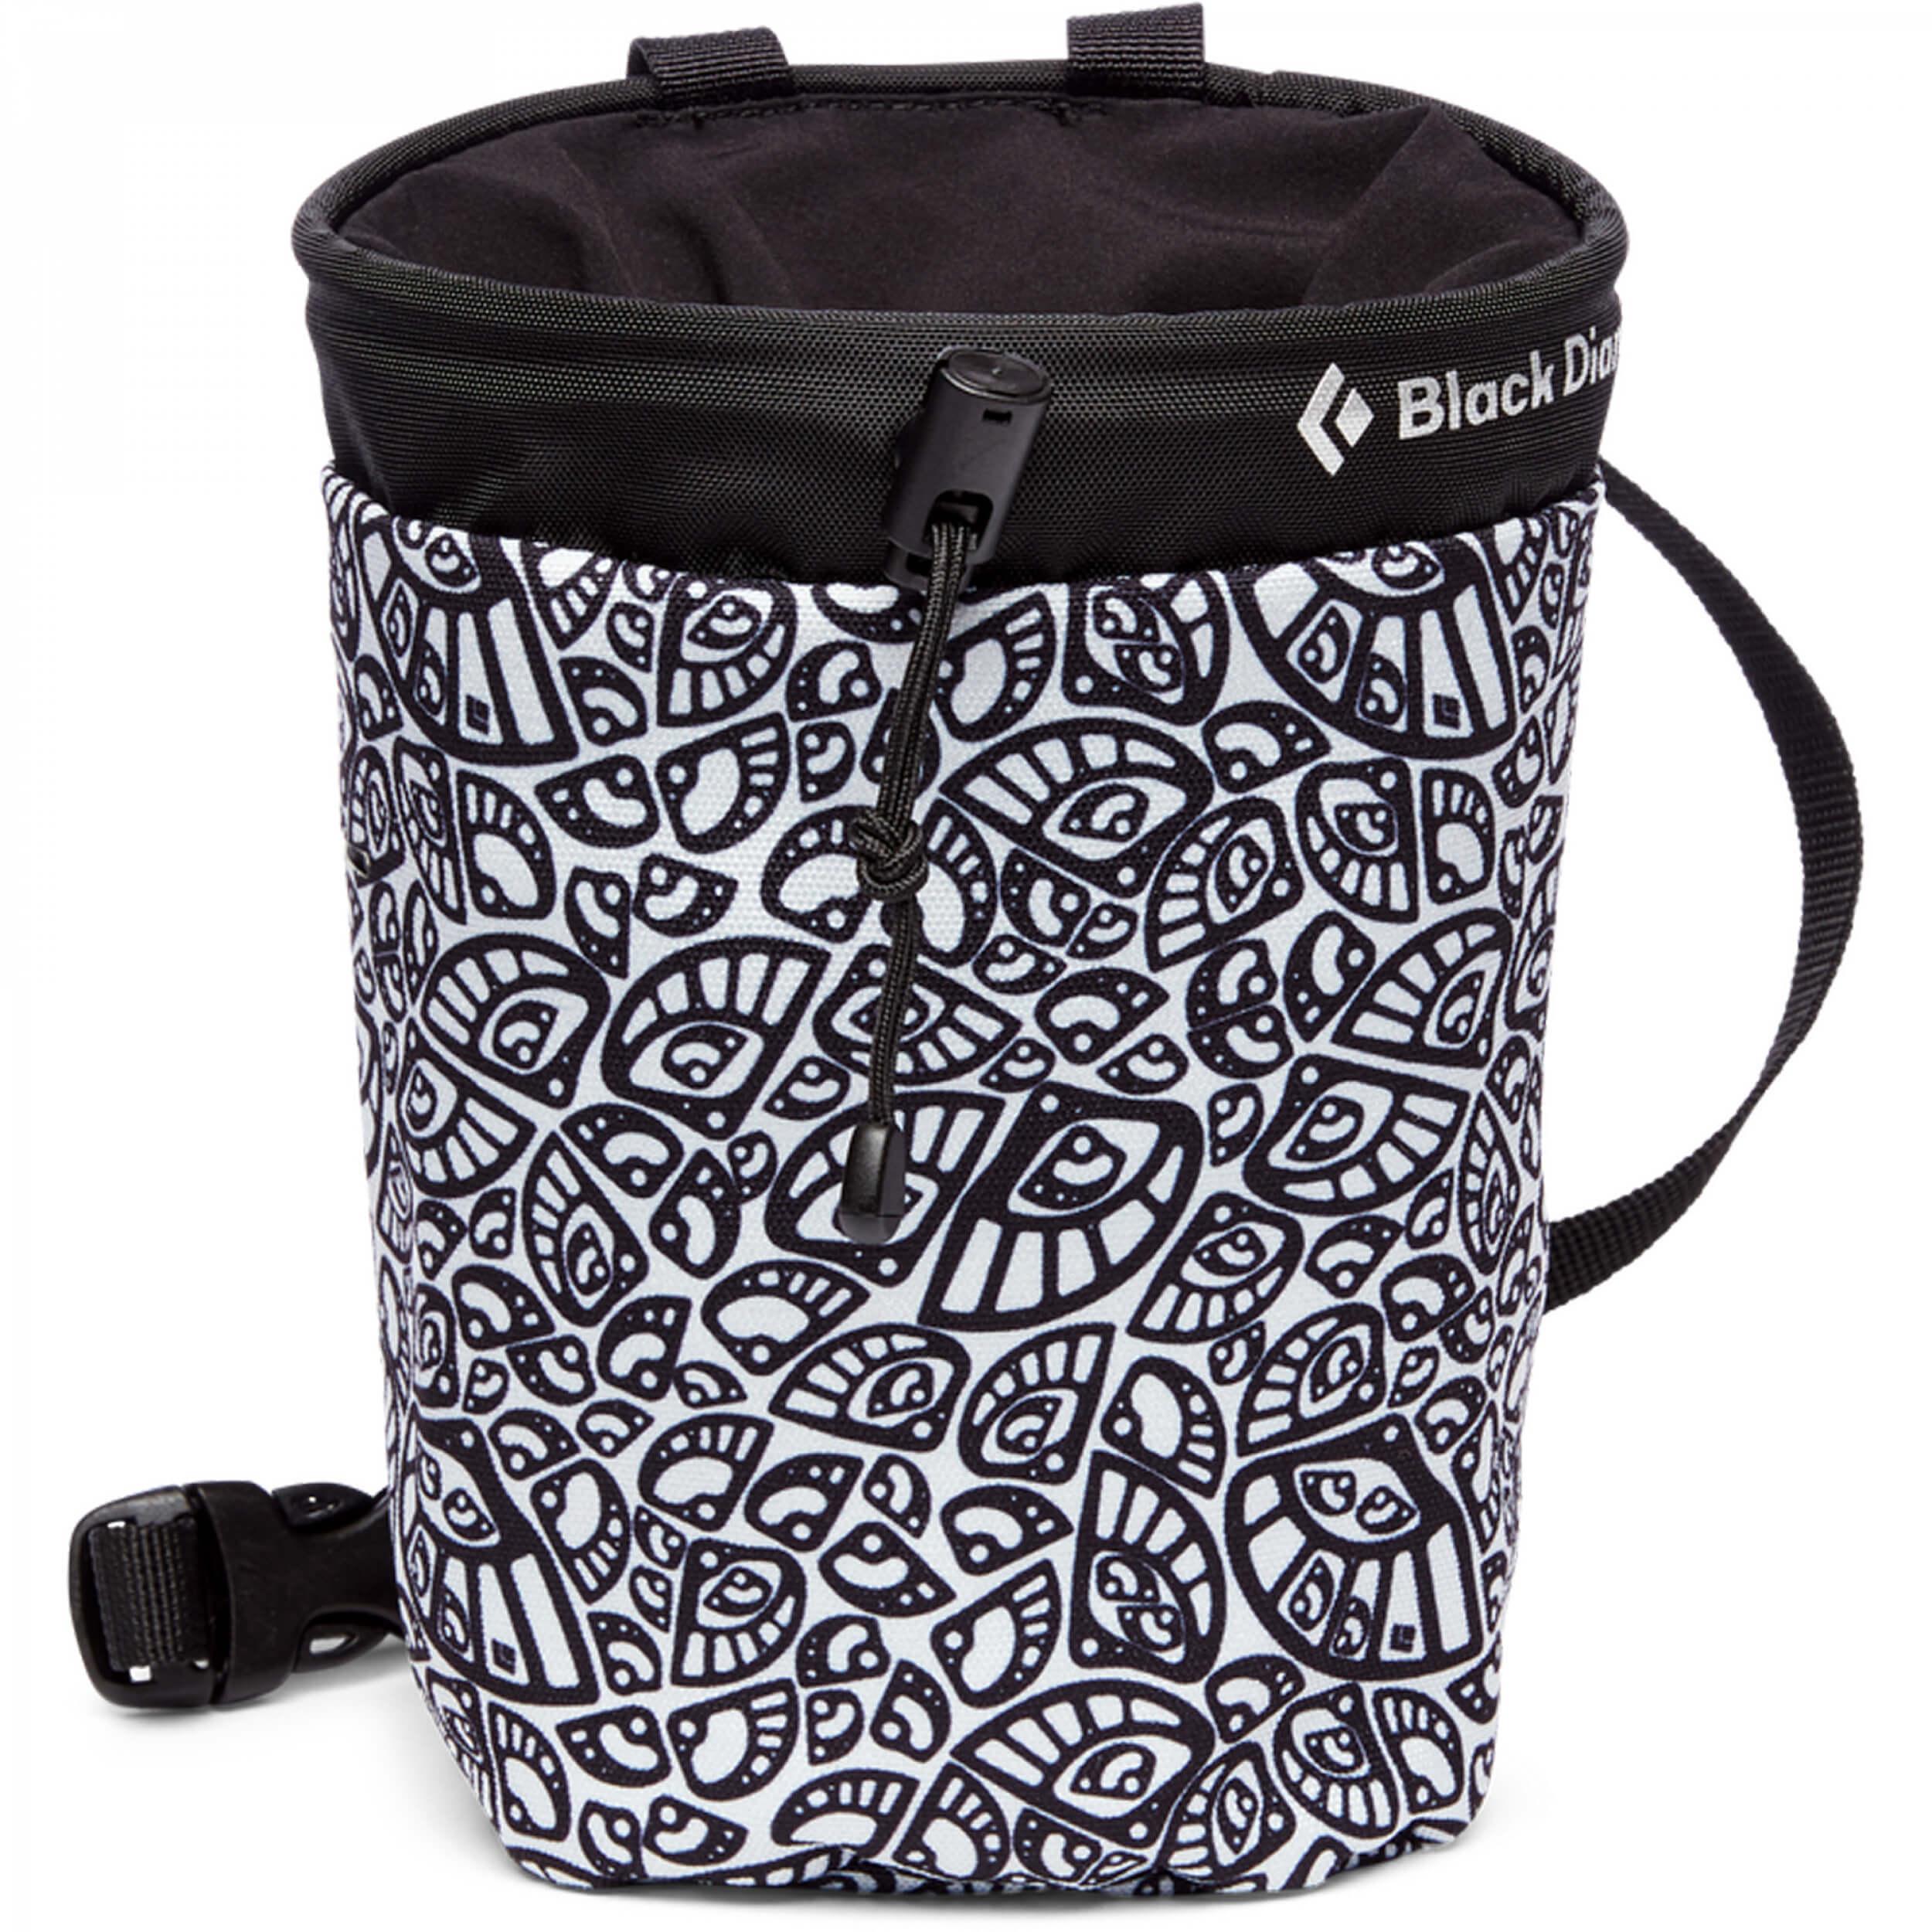 Black Diamond GYM Chalk Bag cam lobe print